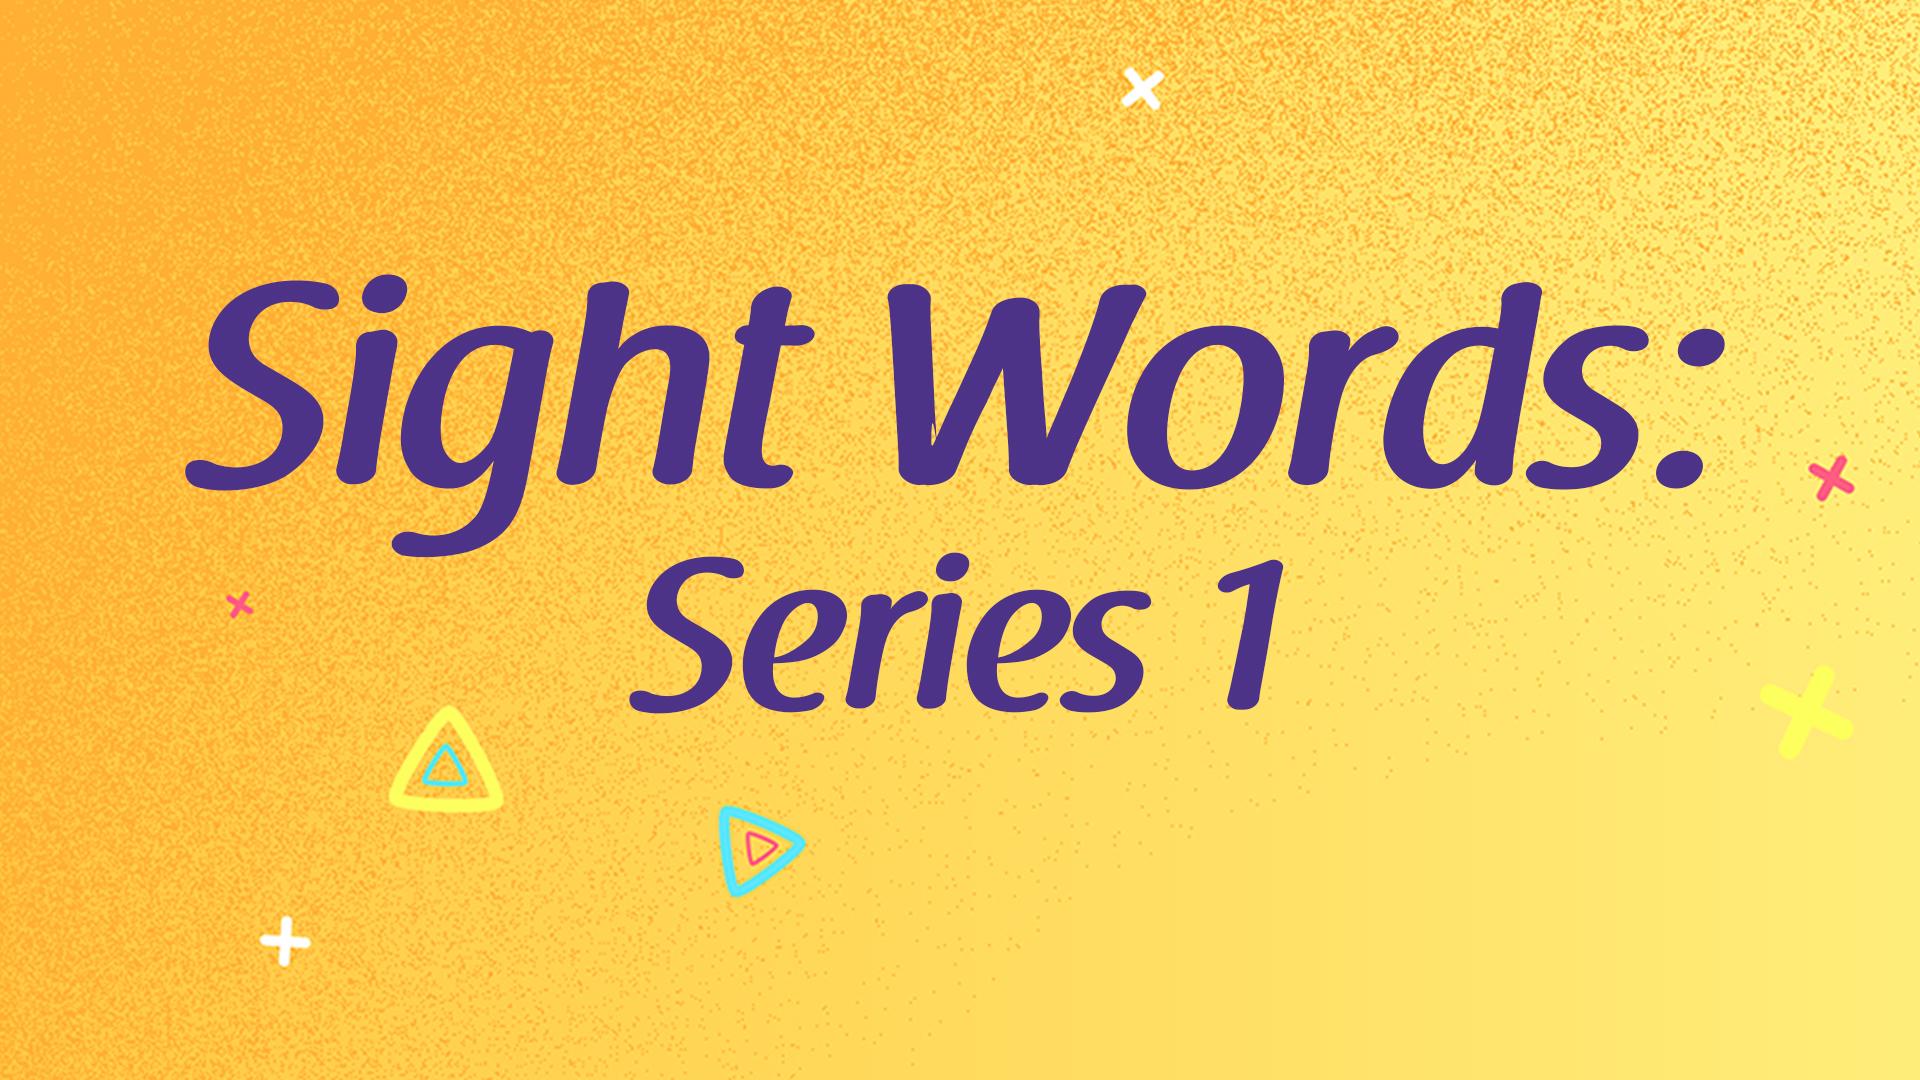 sight words series 1 thumbnail